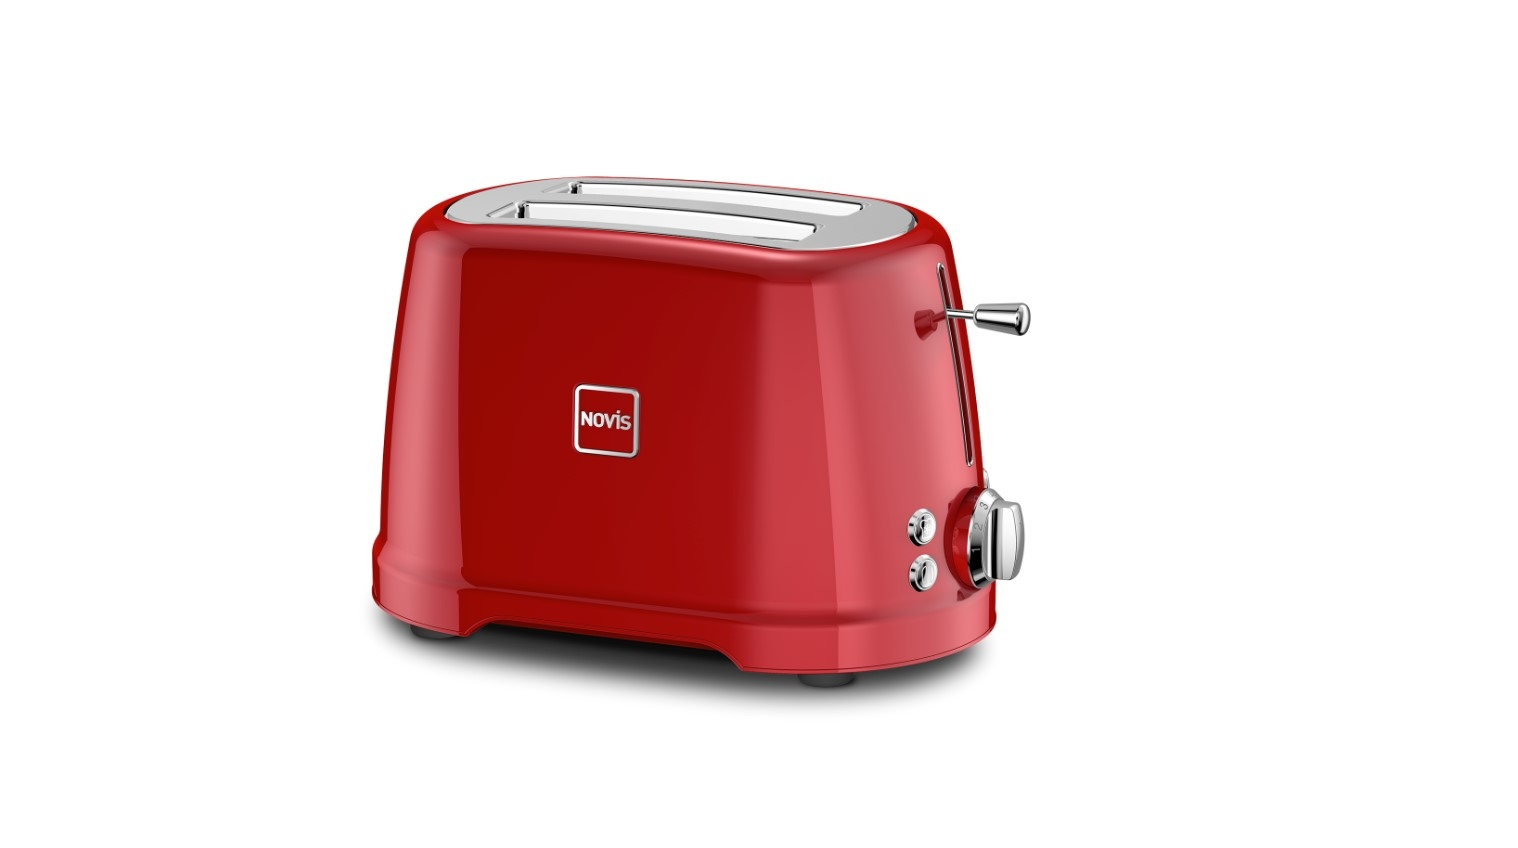 Toaster 2 sloturi, 4 functii, 900W, Novis T2 Rosu